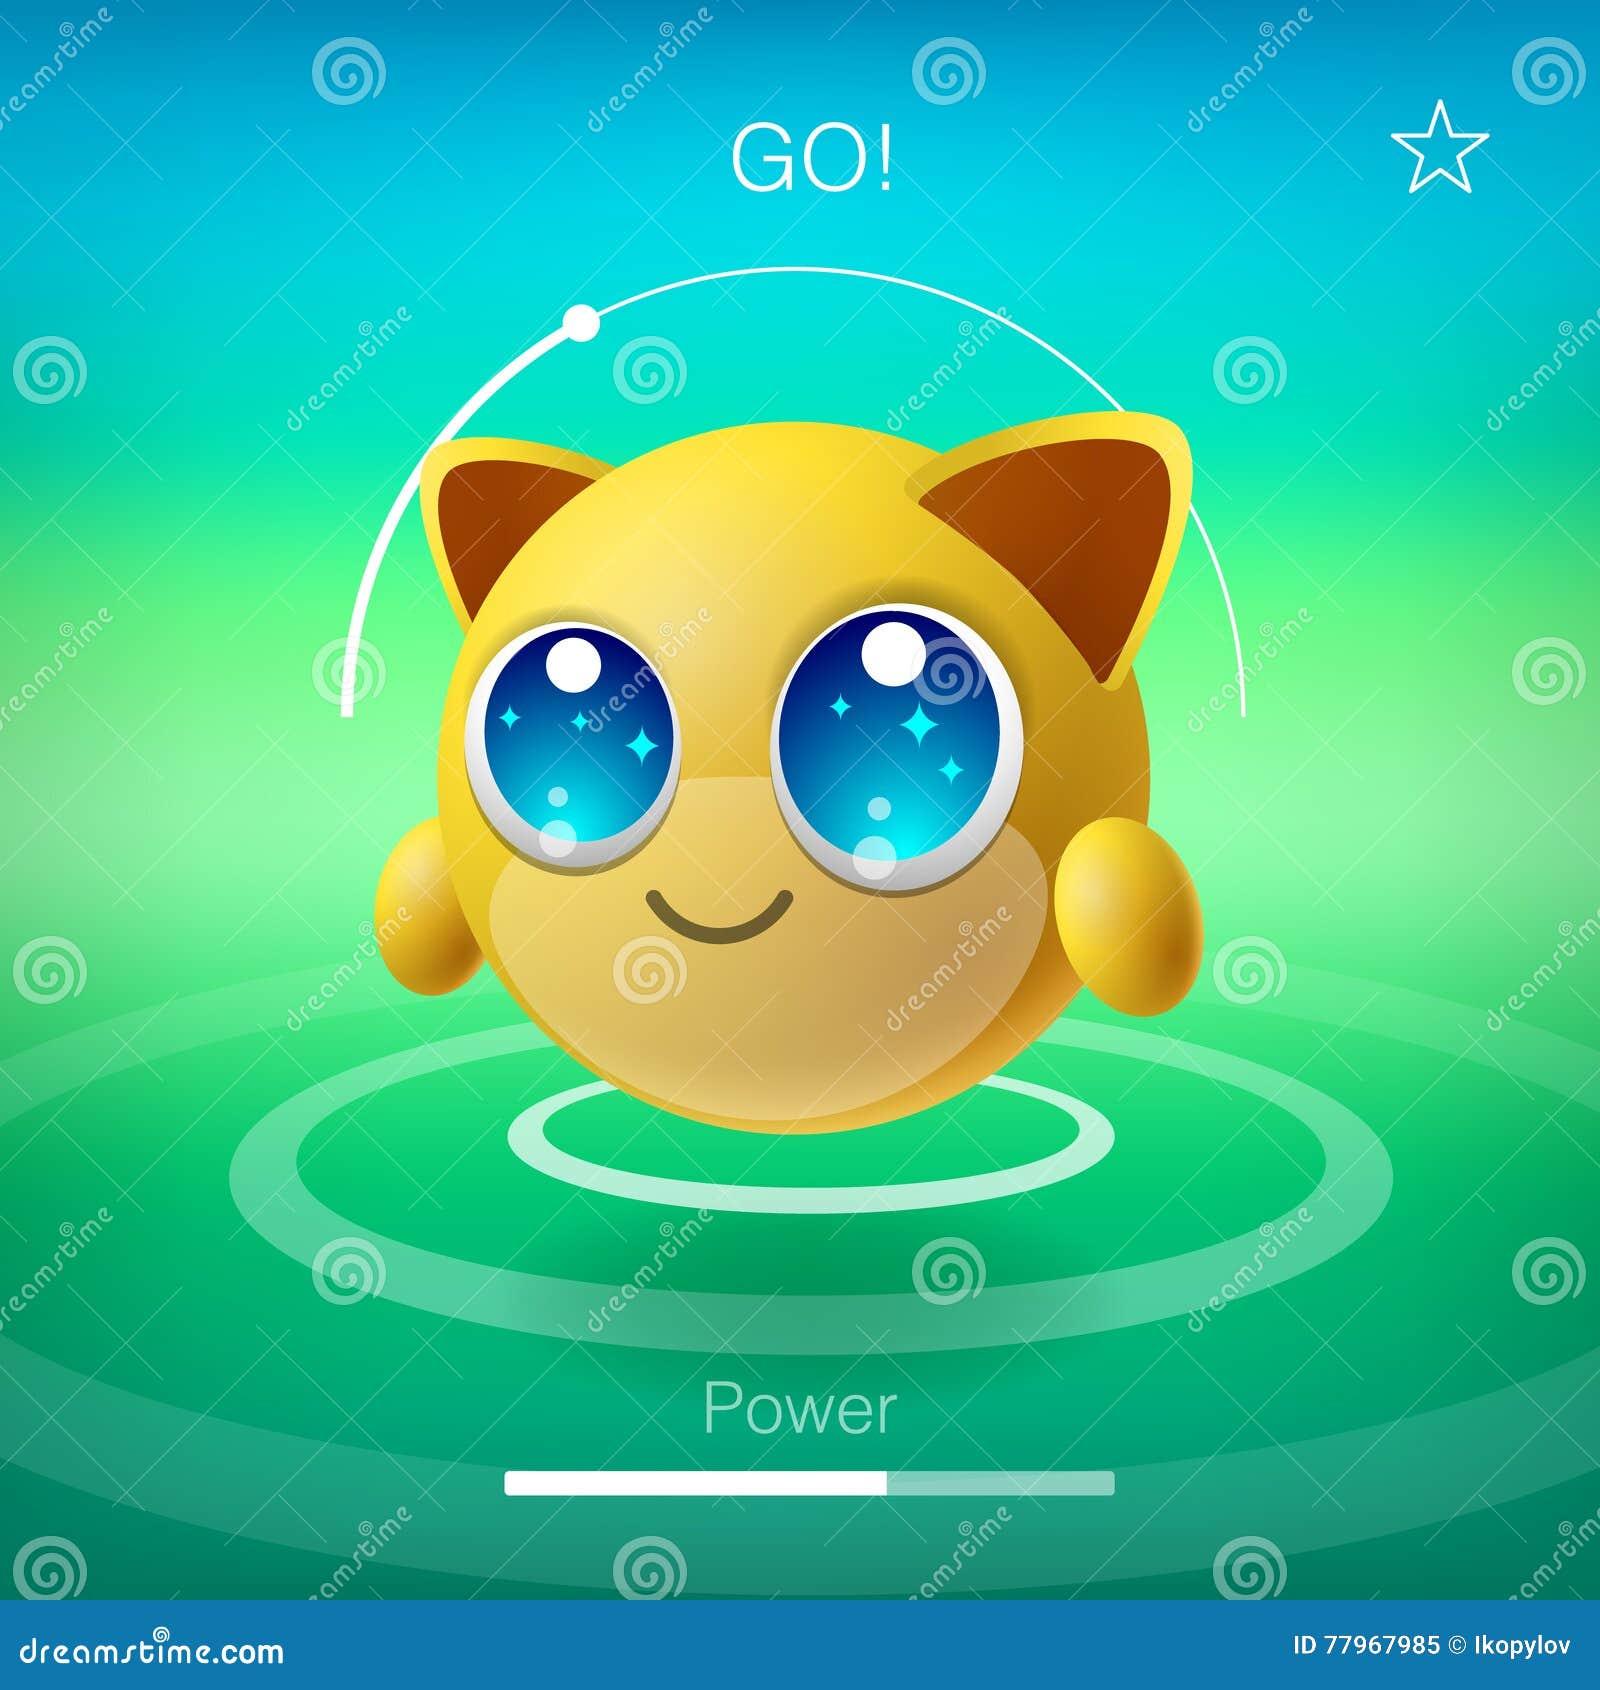 emoji animal mignon avec de grands yeux personnage de dessin anim fond